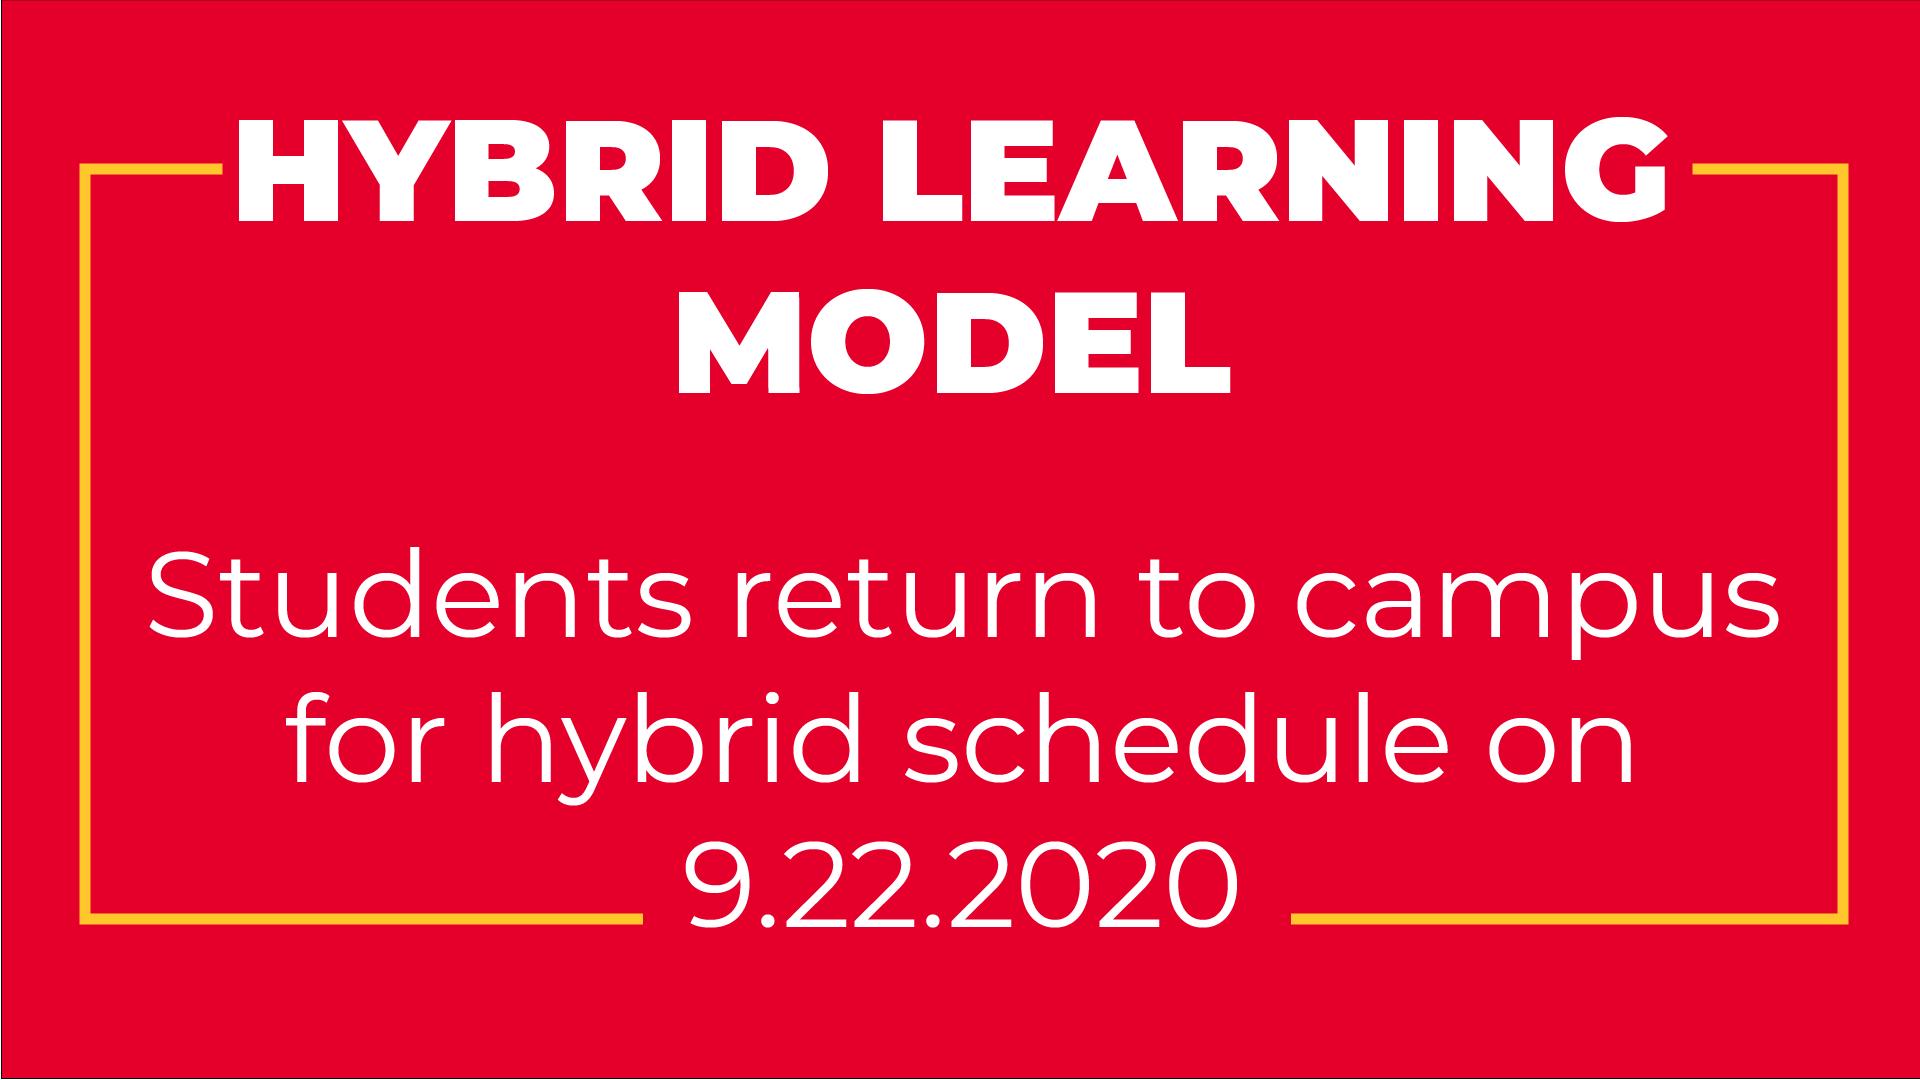 Hybrid Learning Model begins 9.22.2020 Image